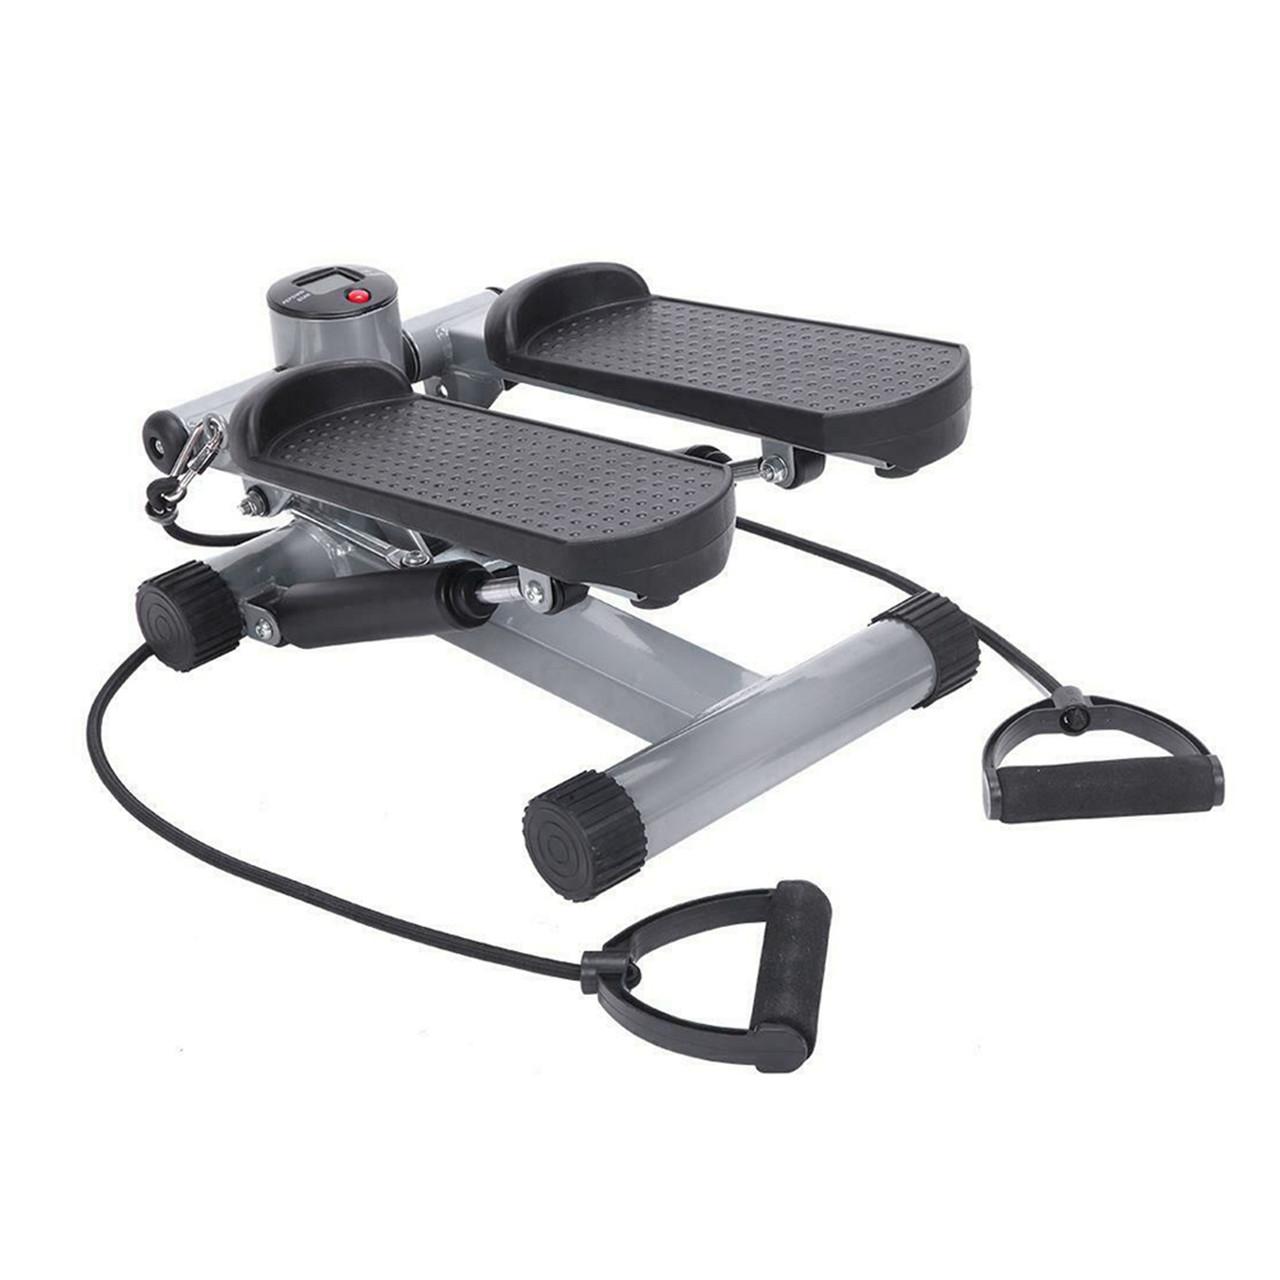 Aerobic Step Fitness Air Stair Climber Stepper Exercise Machine Equipment